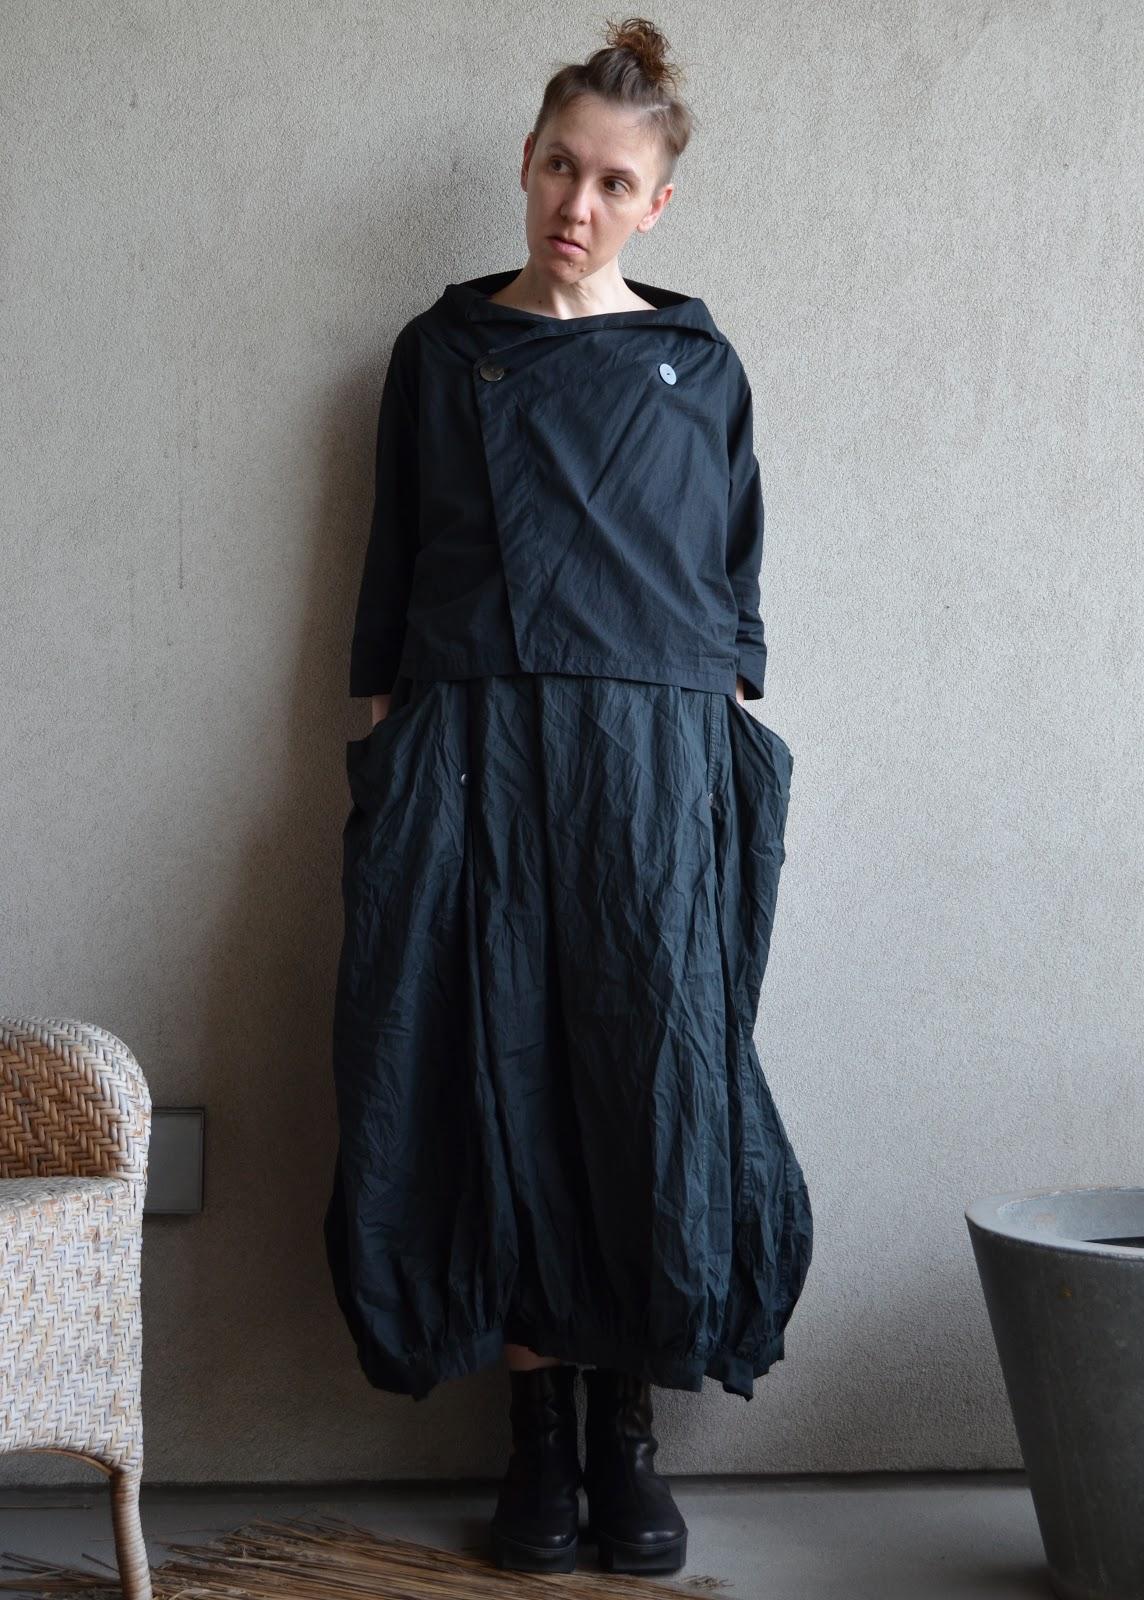 Wardrobe Tales: the uncomfortable comfortable dress